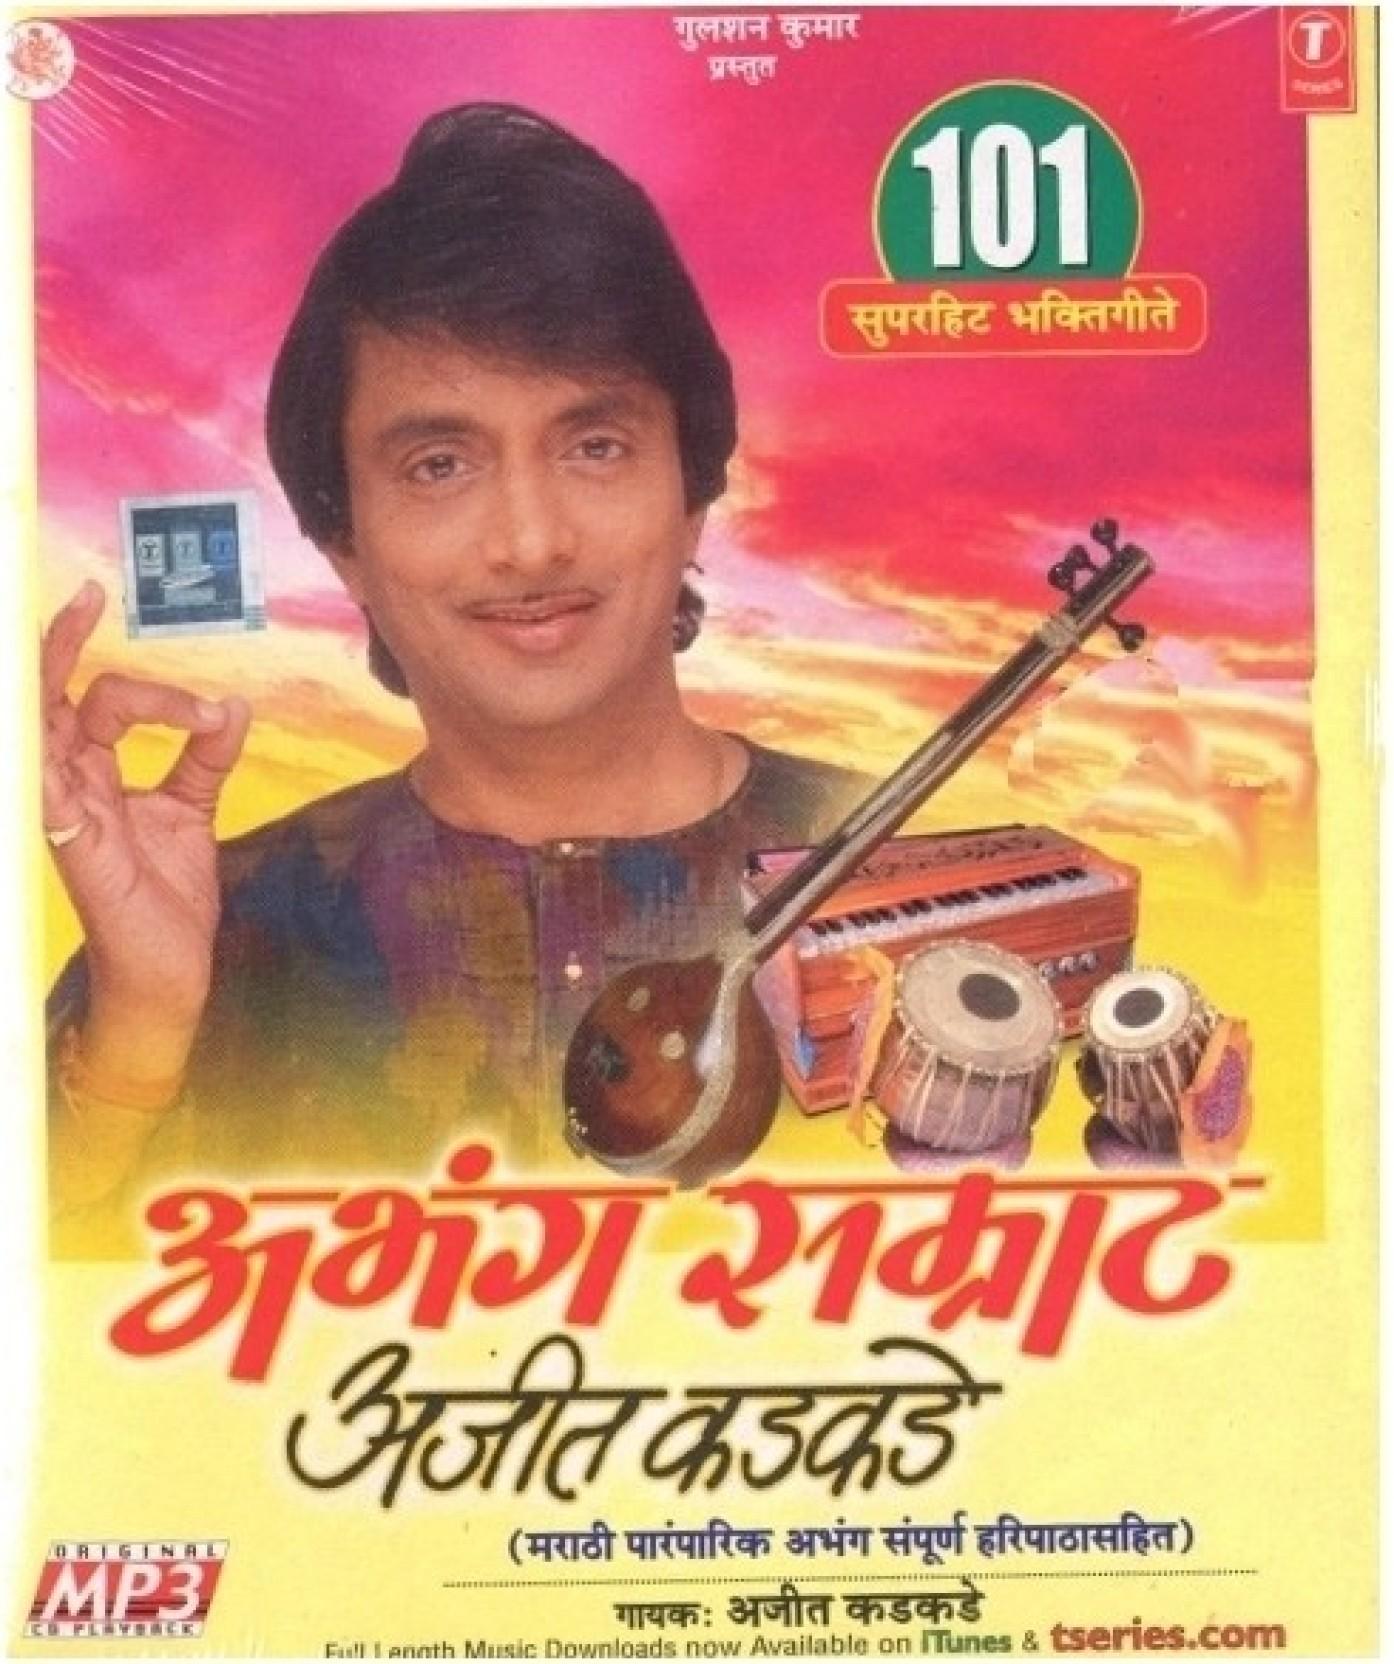 Marathi Devotional Abhang Ajit Kadkade Mp3 Free Download - Mp3Take